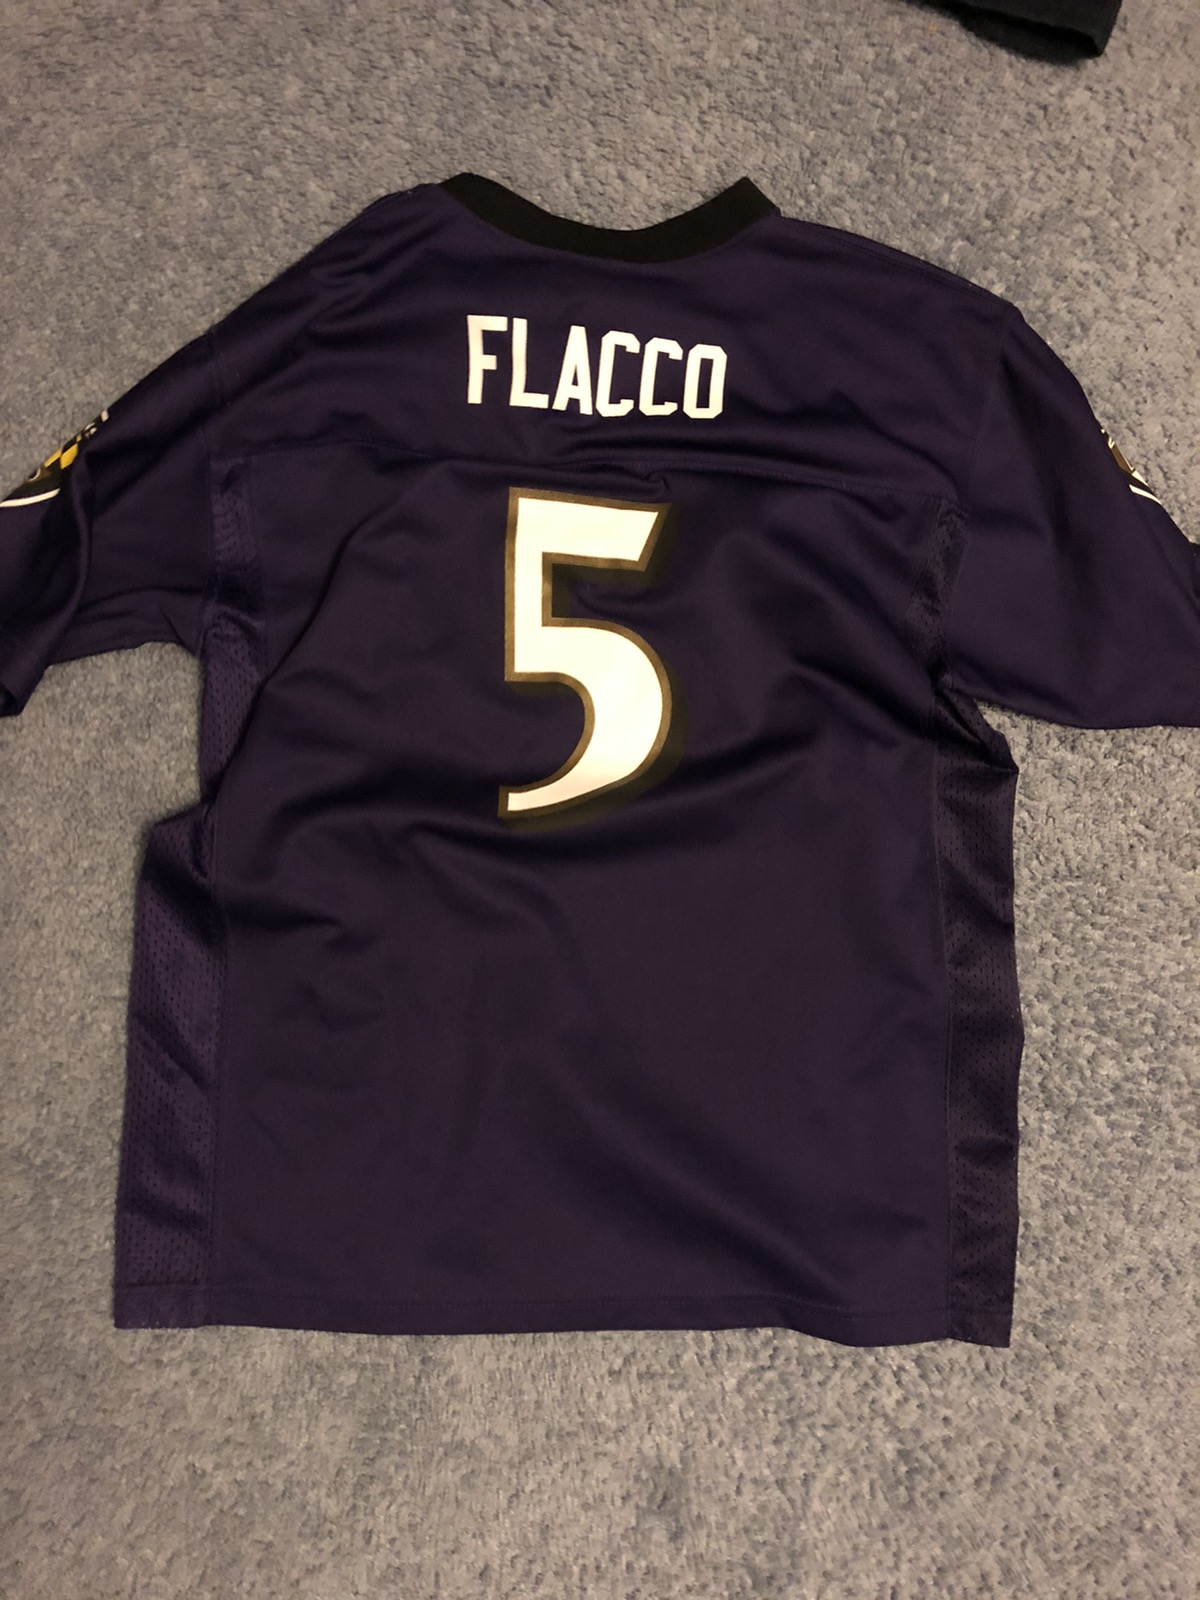 NFL Youth XL Joe Flacco ravens jersey